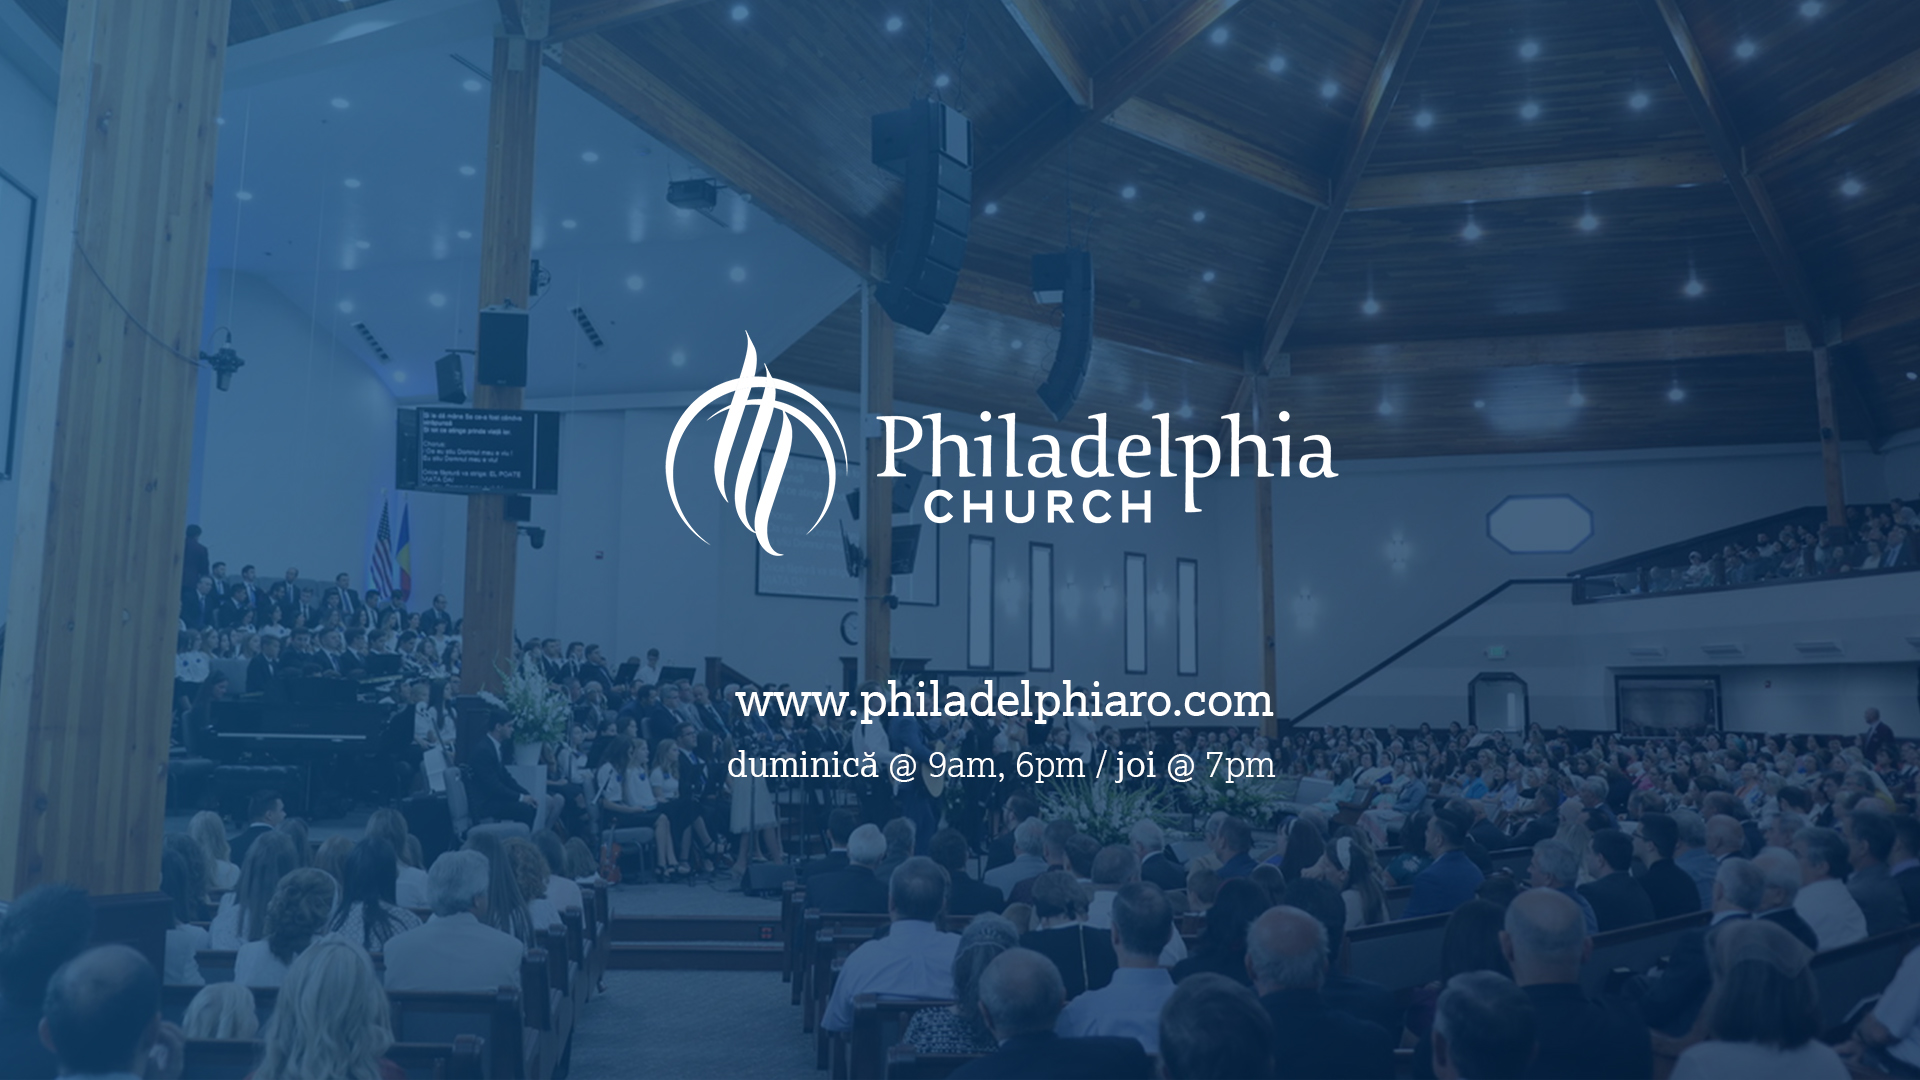 Philadelphia Romanian Pentecostal Church of Portland, OR